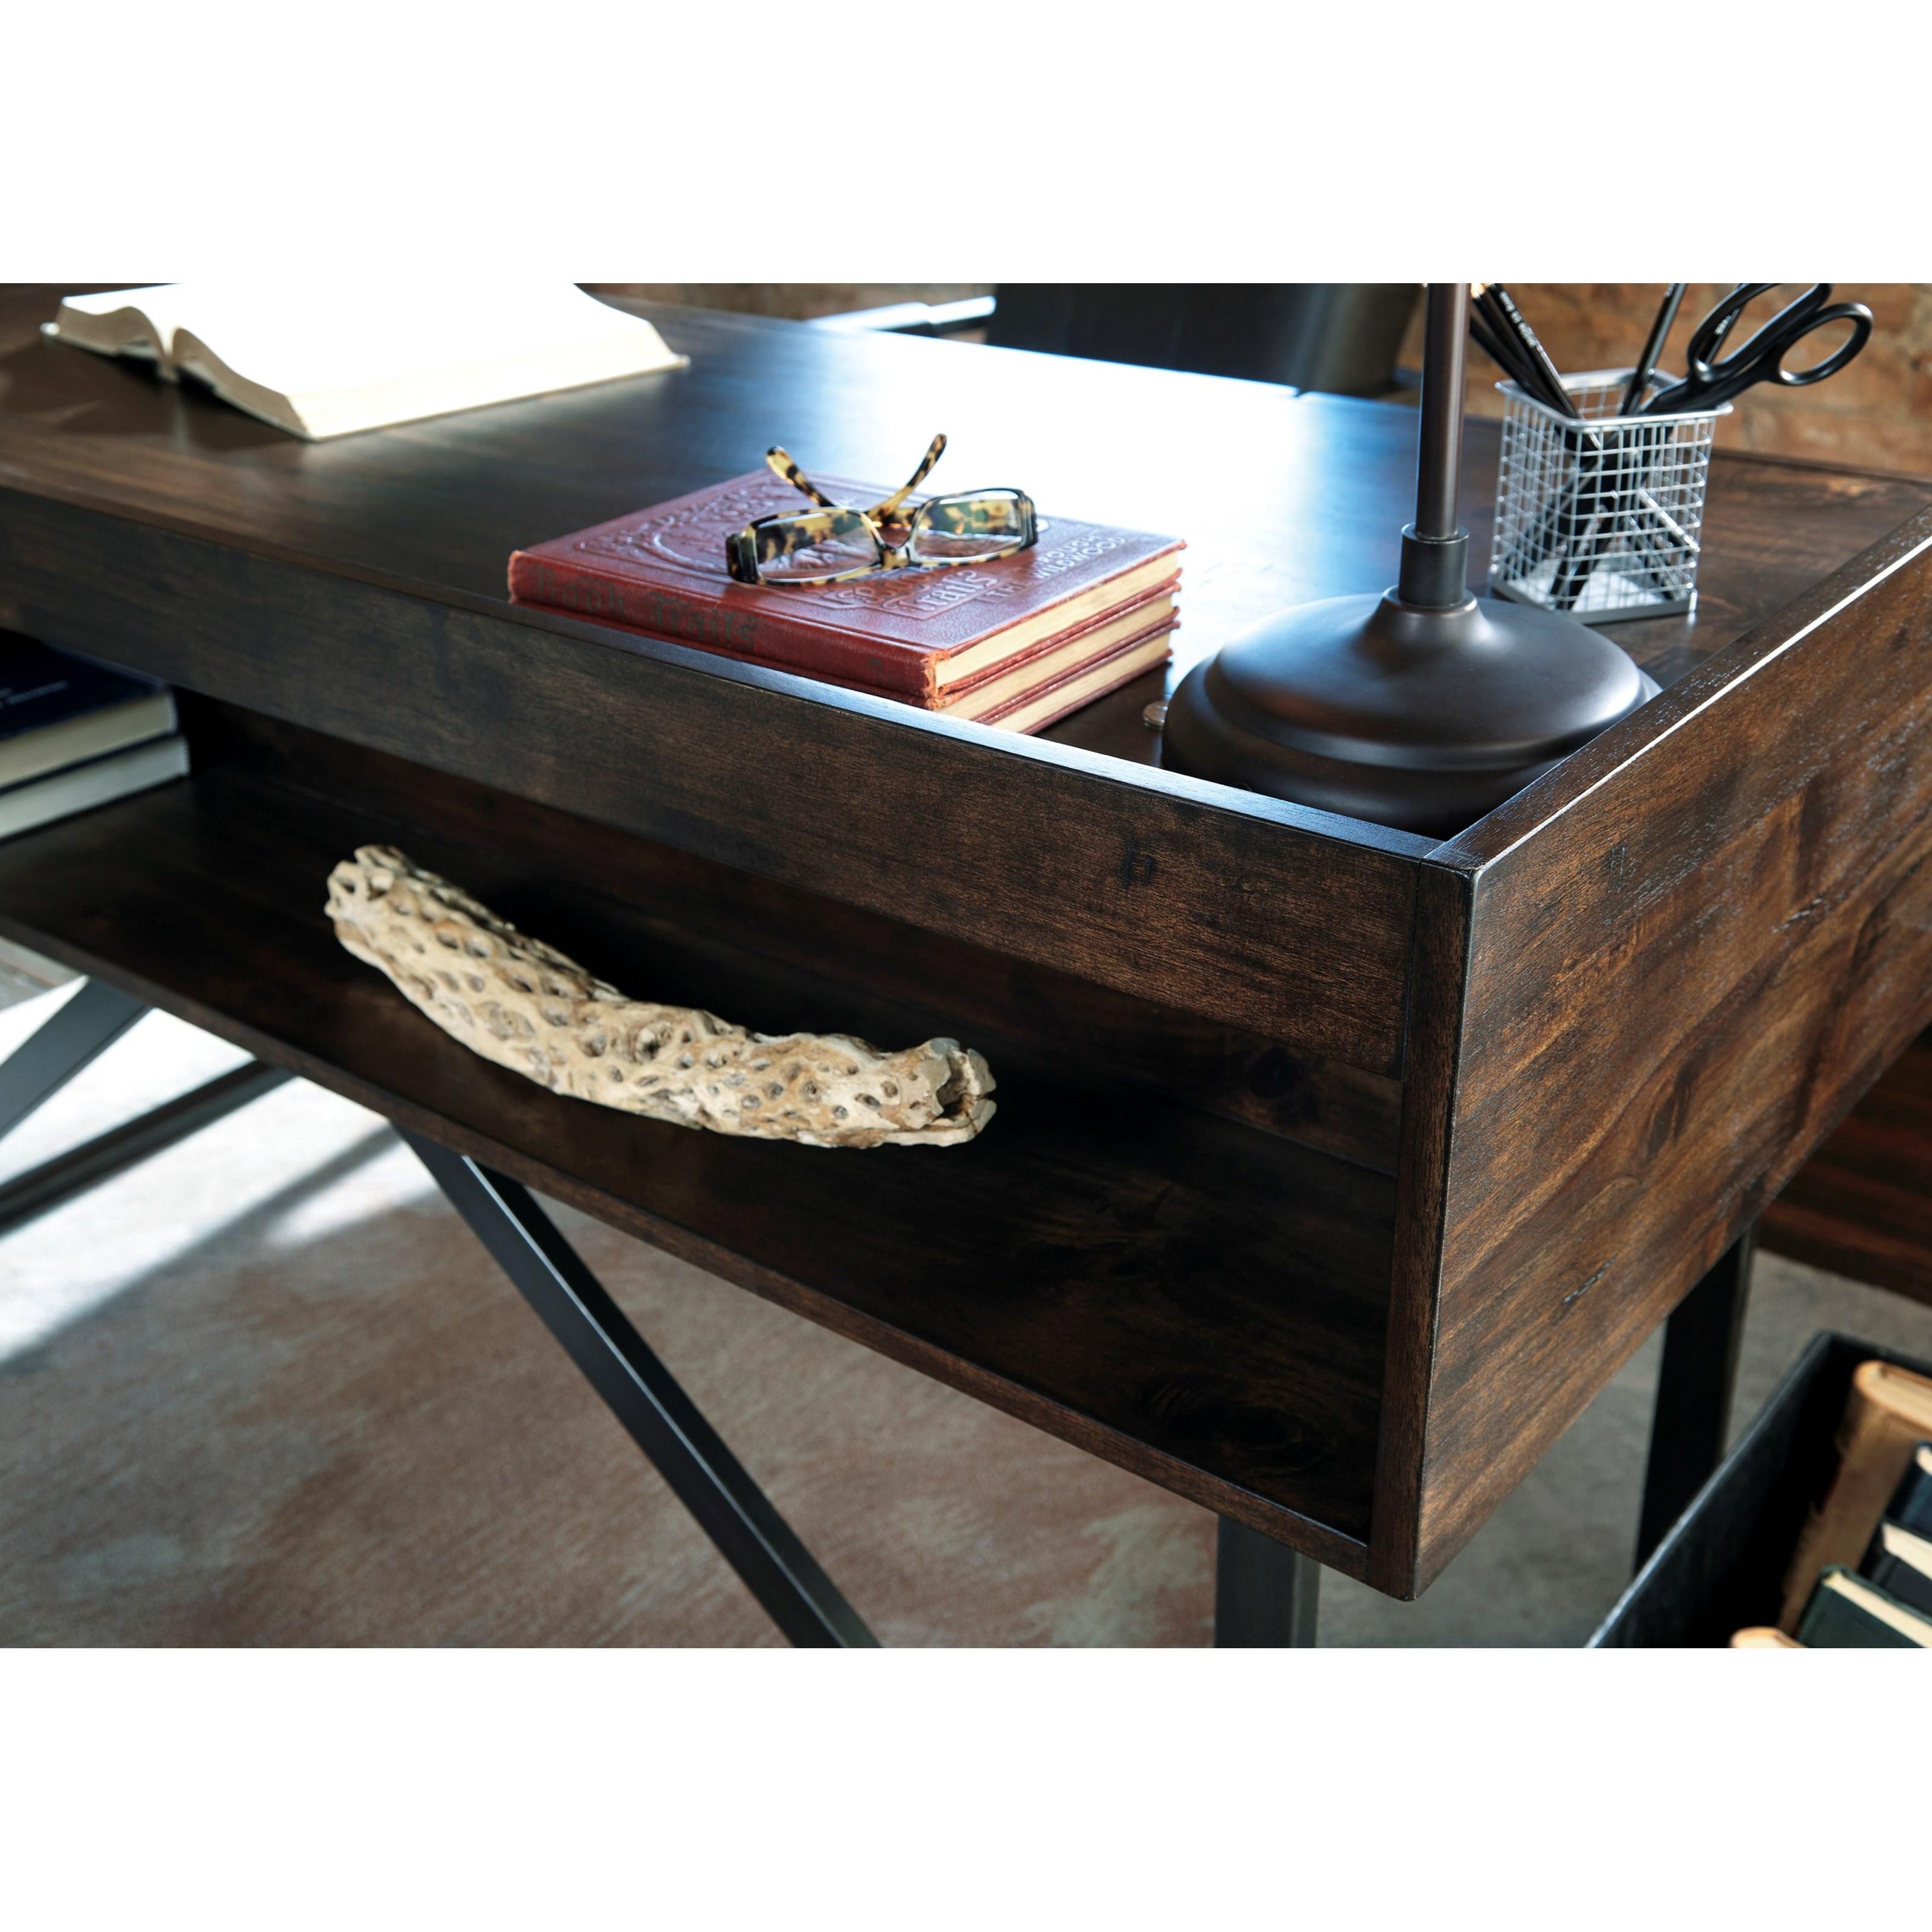 industrial home office desk modern rustic industrial home office desk with steel base american retro style industrial furniture desk